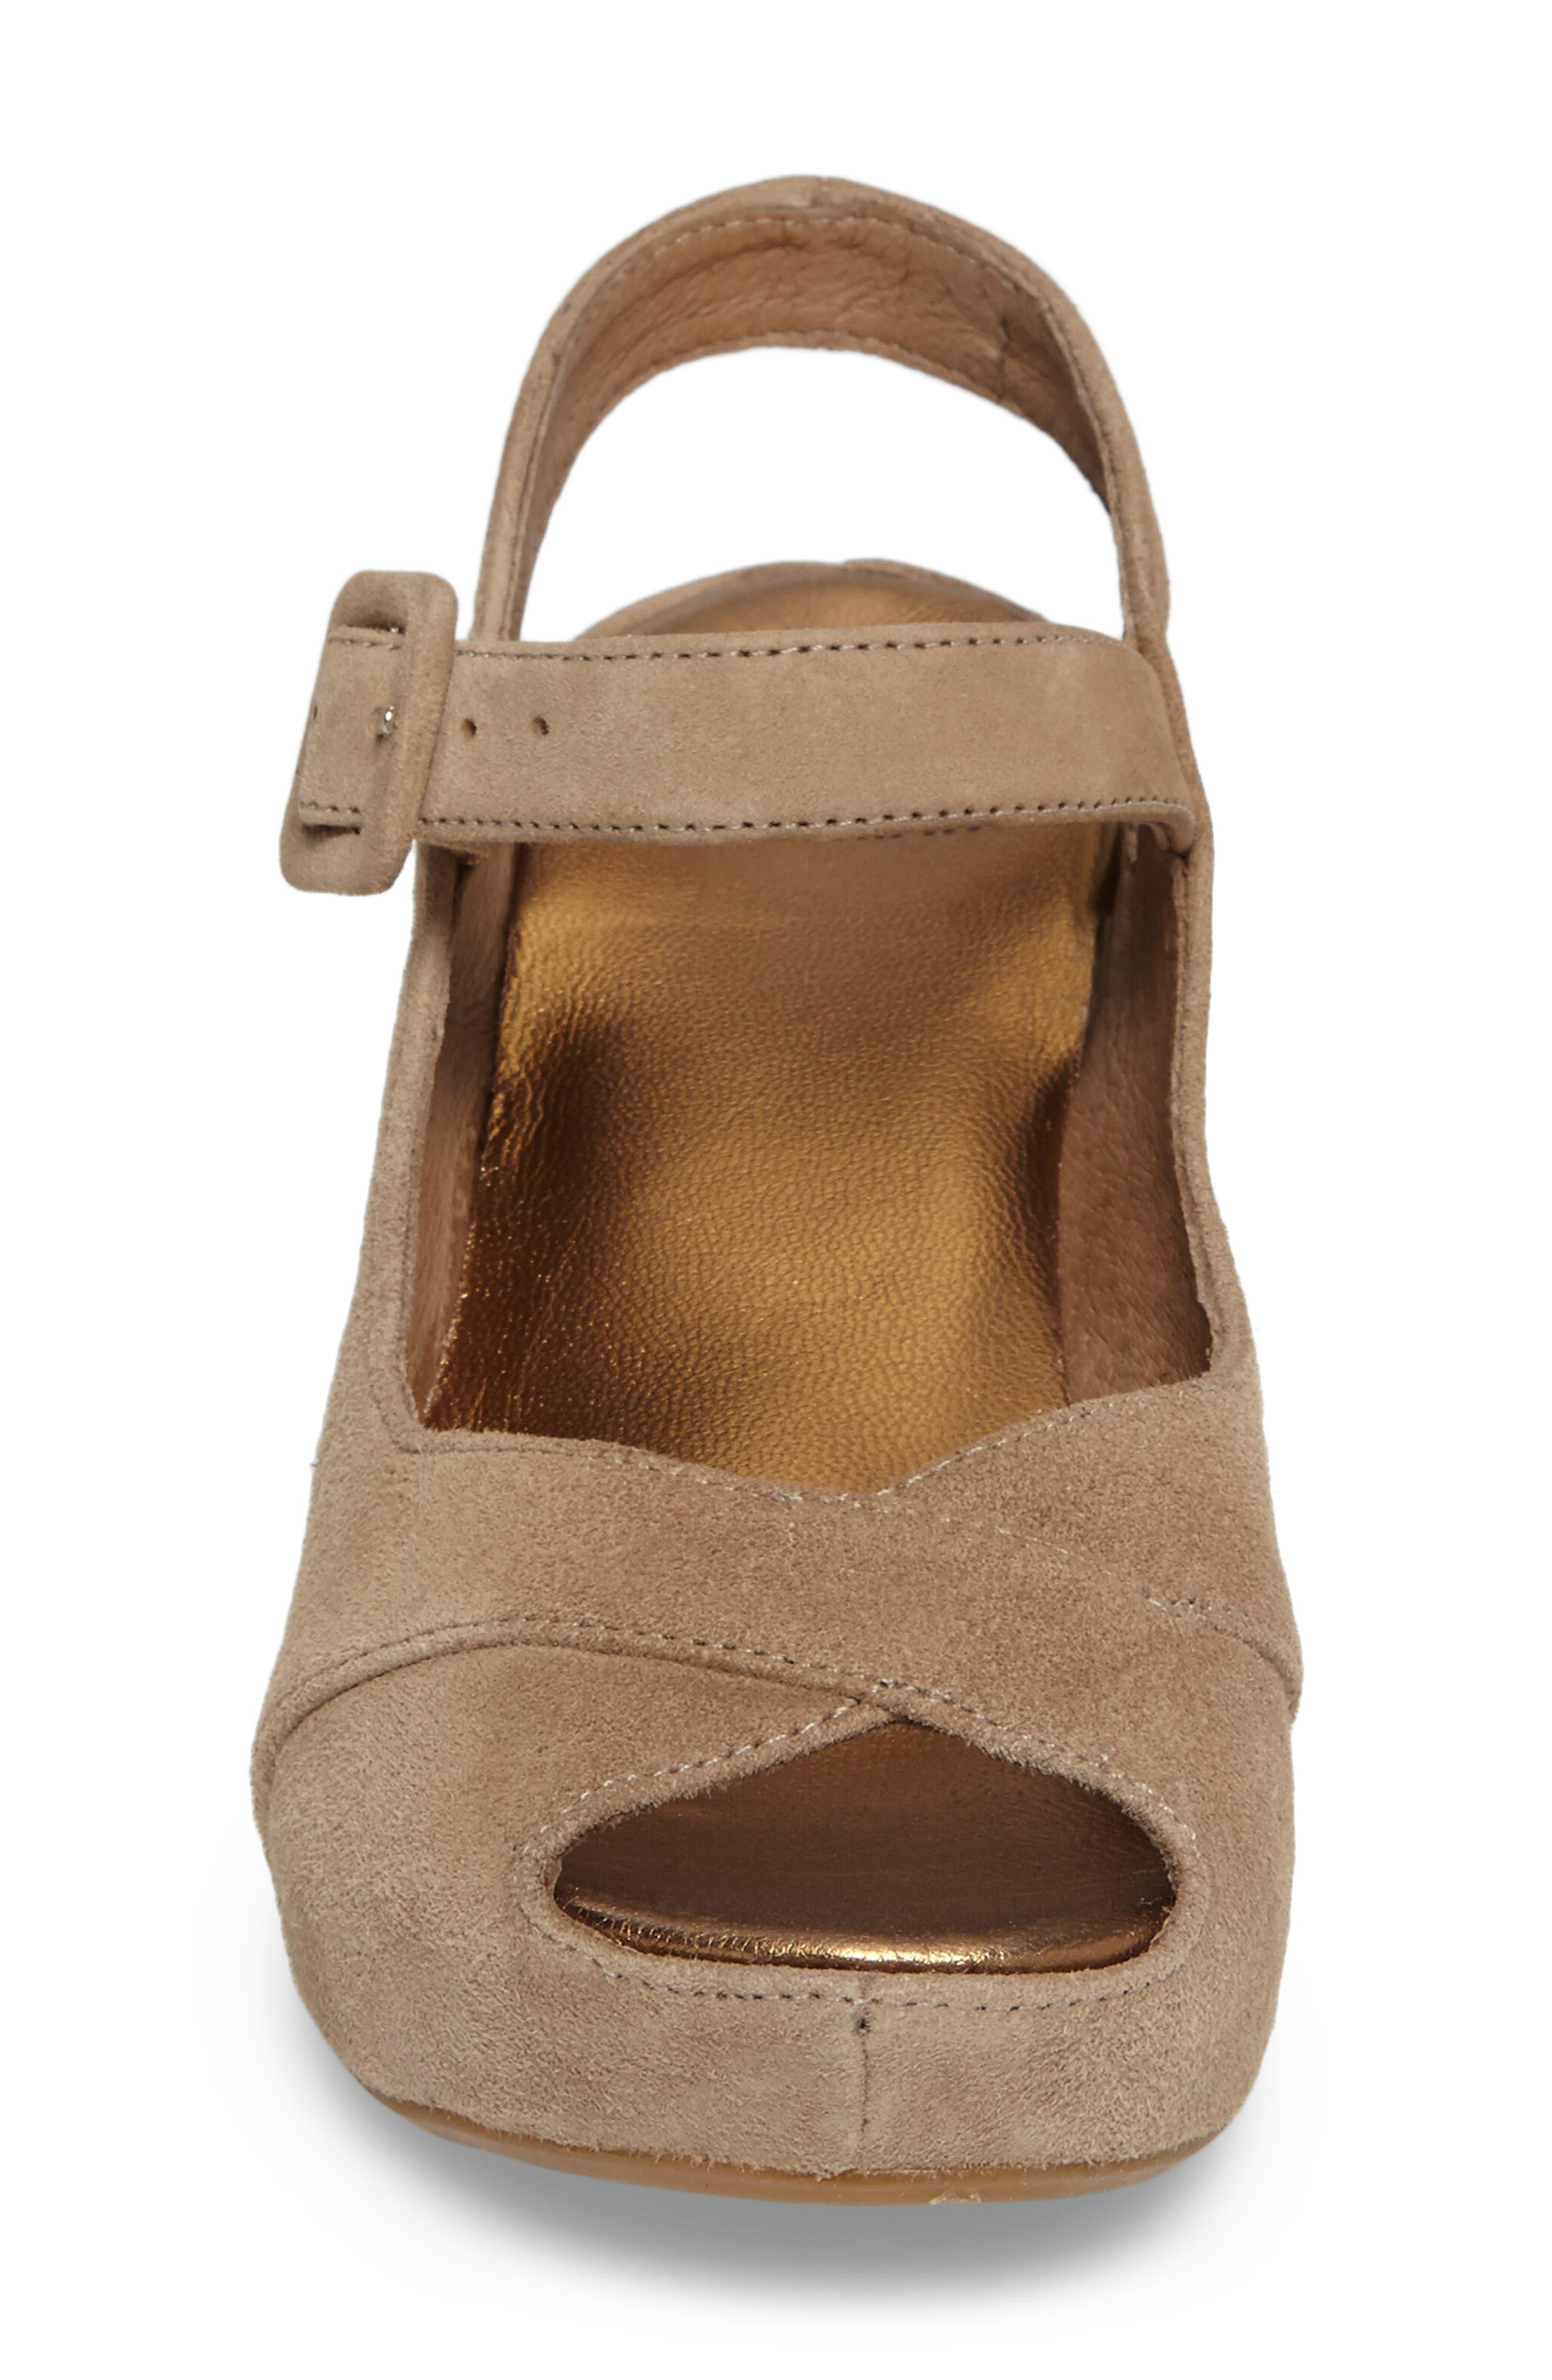 Tara Platform Wedge Sandal,                             Alternate thumbnail 4, color,                             Taupe Suede